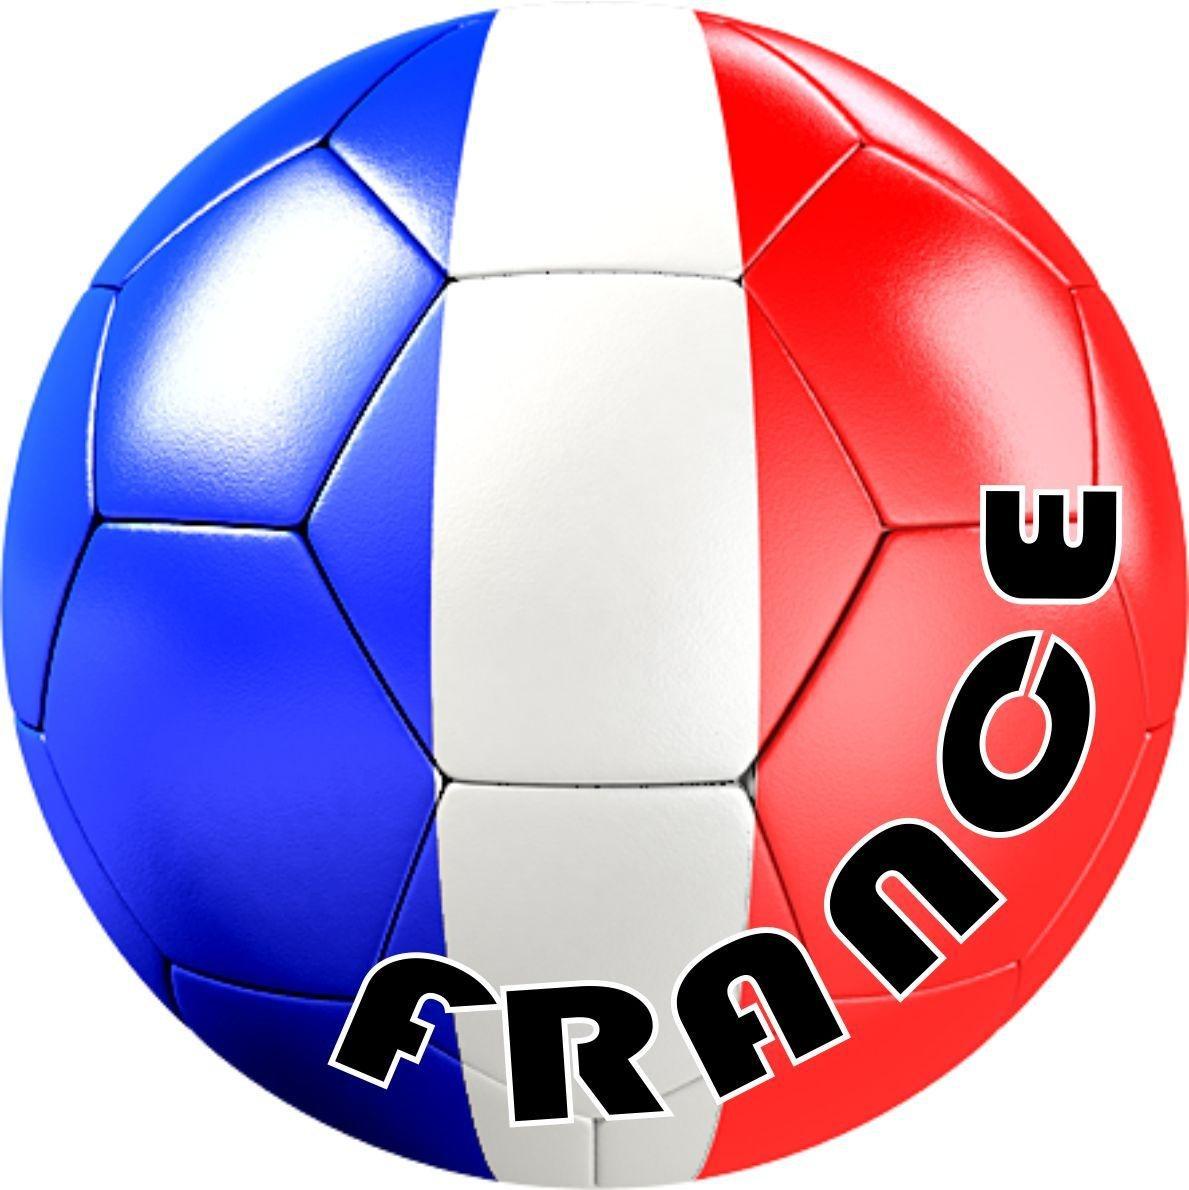 Akachafactory autocolant Sticker Equipe Voiture Moto Football Drapeau Sport Ballon Foot France